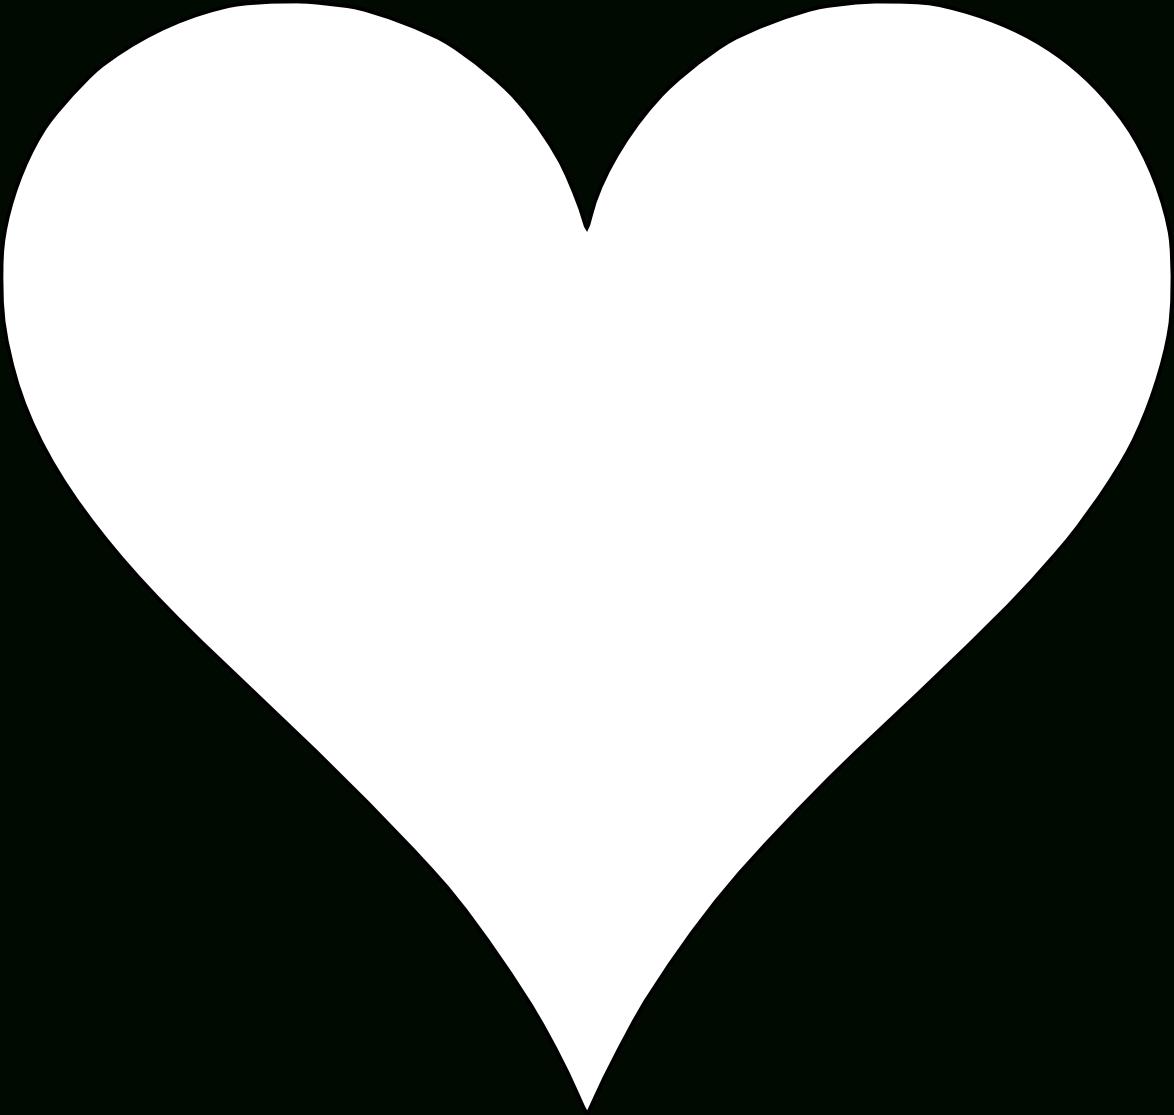 Heart Template Printable - Kaza.psstech.co - Free Printable Valentine Heart Patterns